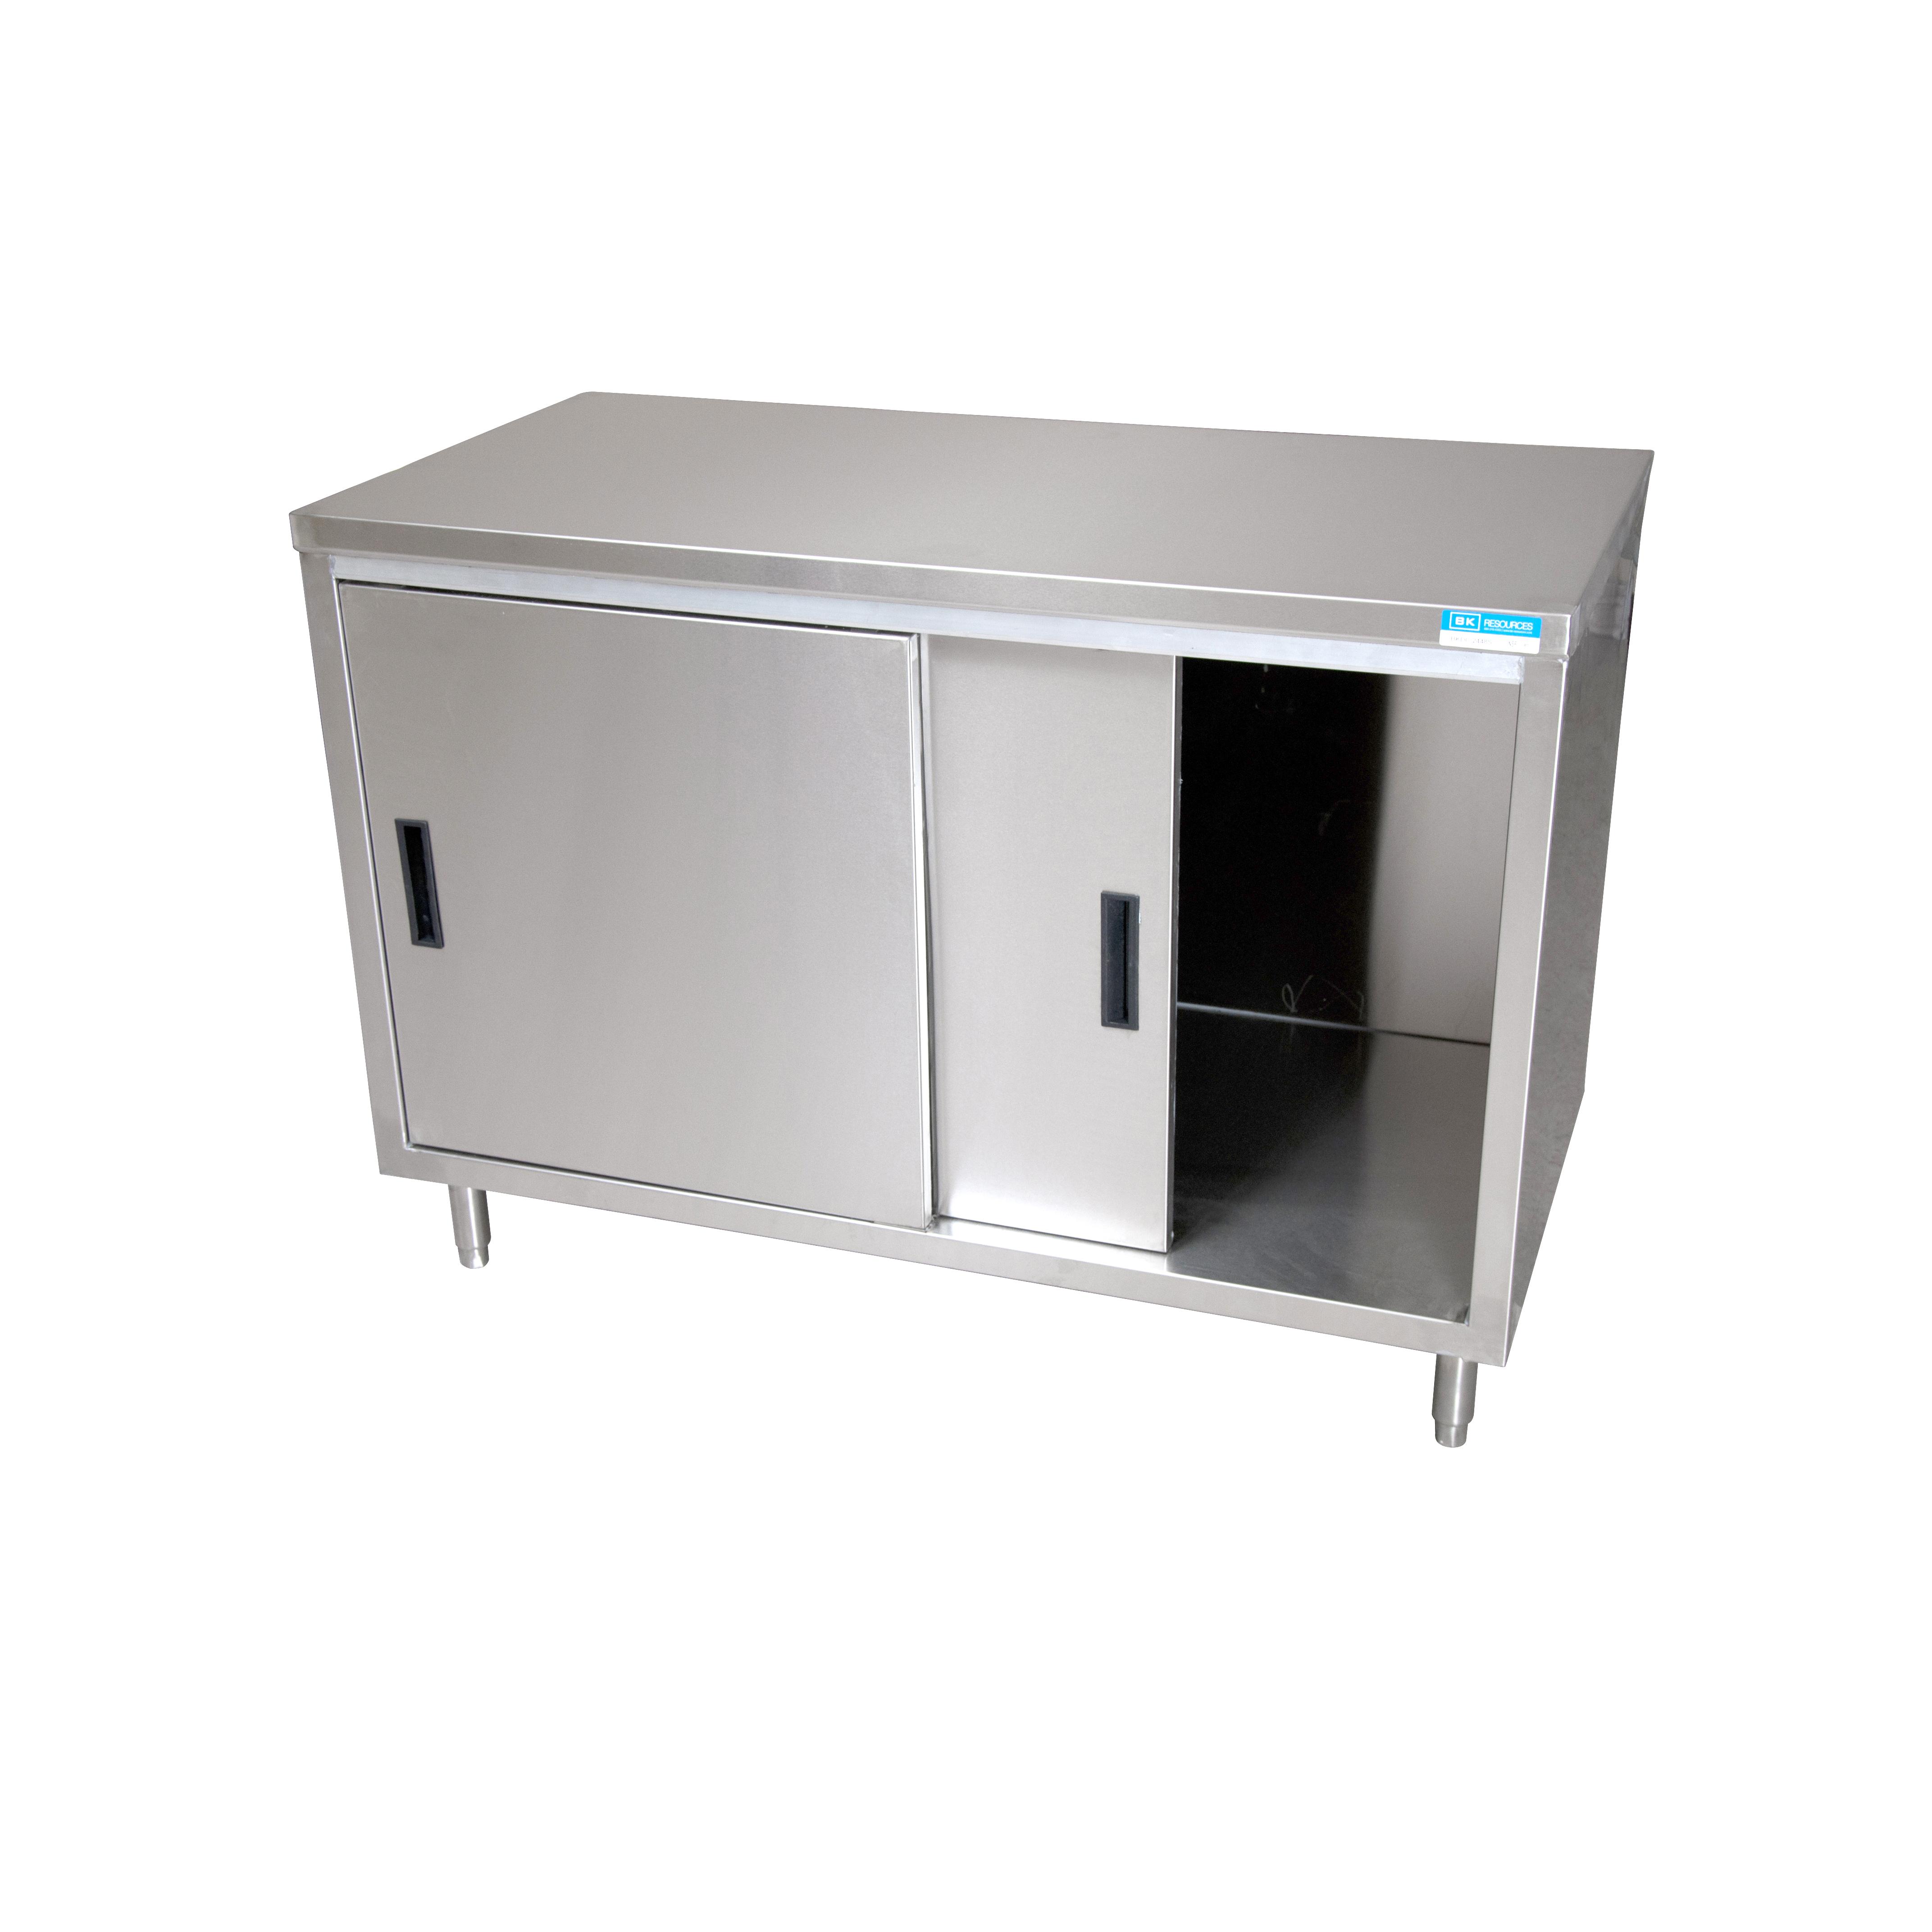 BK Resources BKDC-3660S work table, cabinet base sliding doors